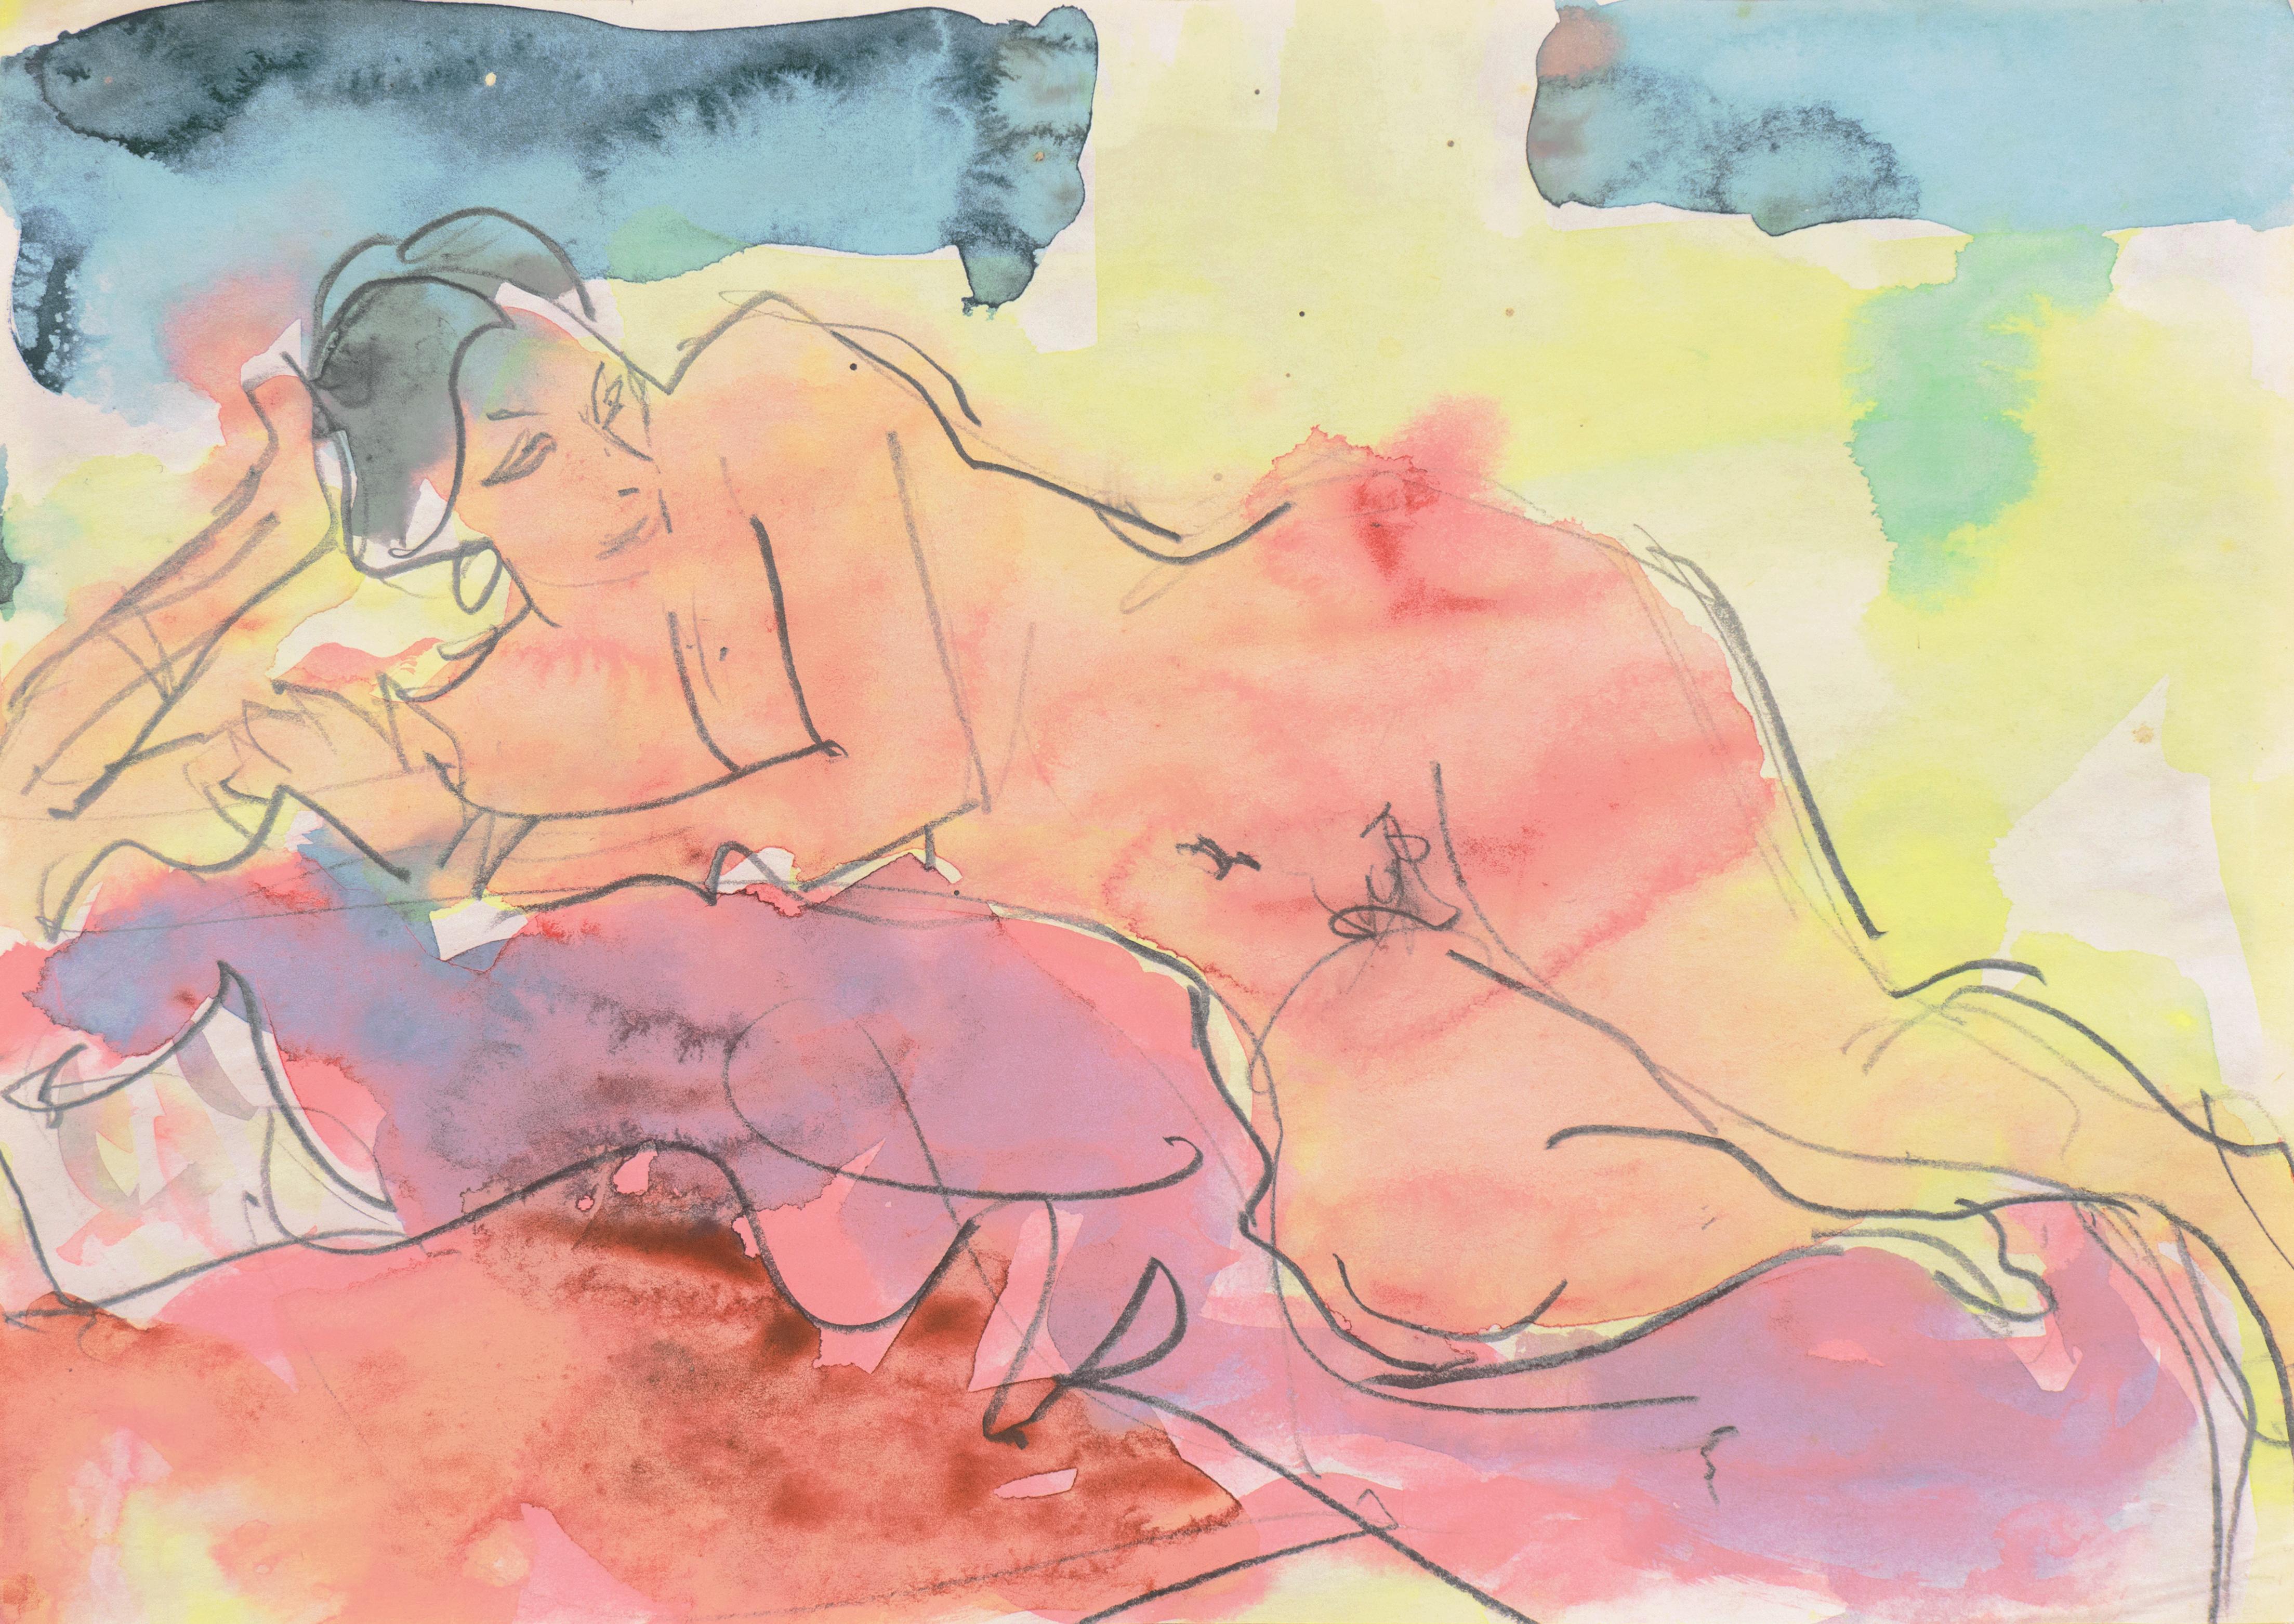 'Reclining Nude', Carmel, California, Louvre, Academie Chaumiere, SFAA, LACMA